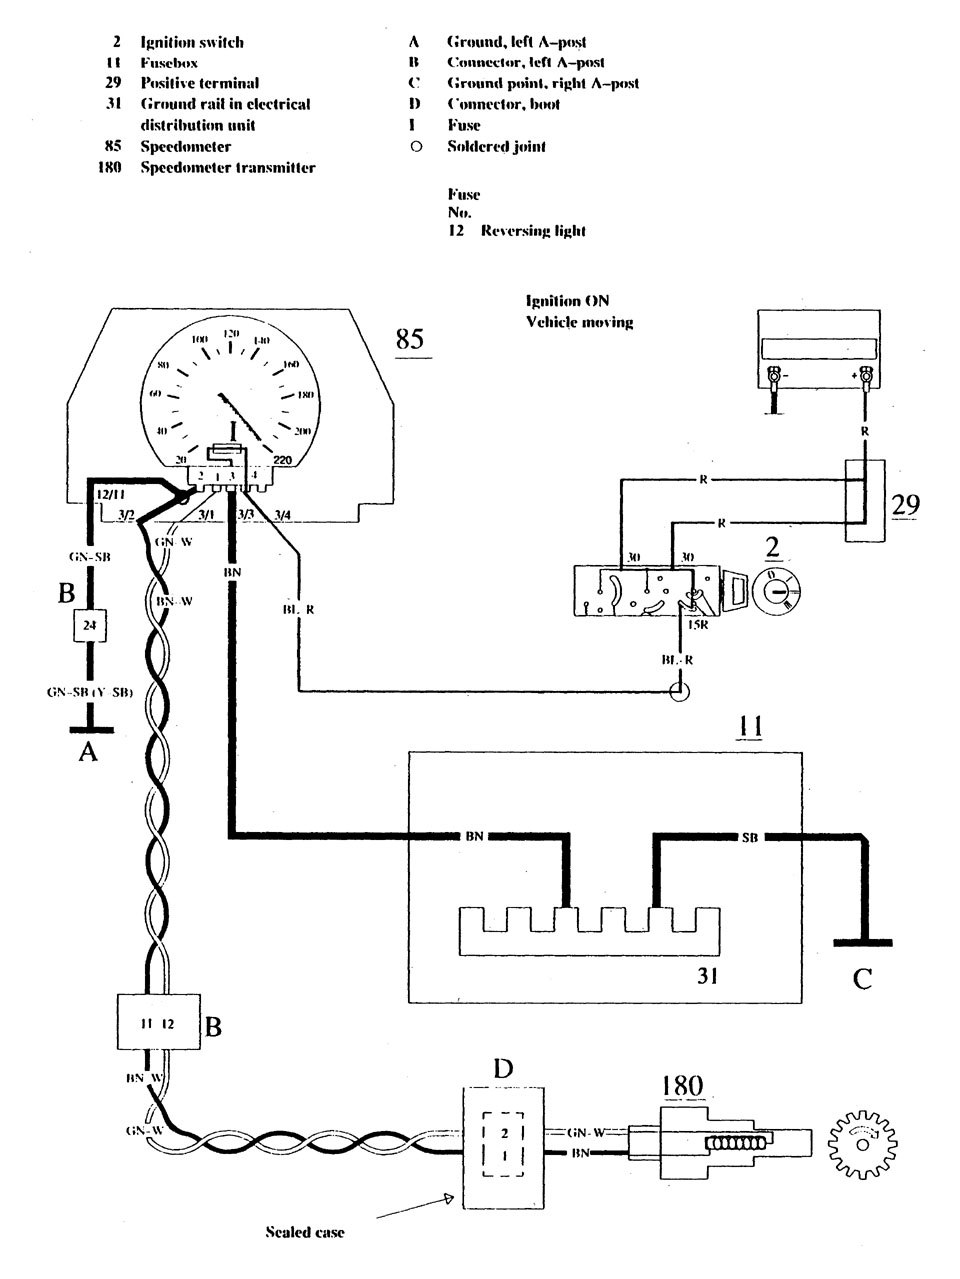 Volvo 740 Ignition Switch Wiring Diagram | Digital Resources on